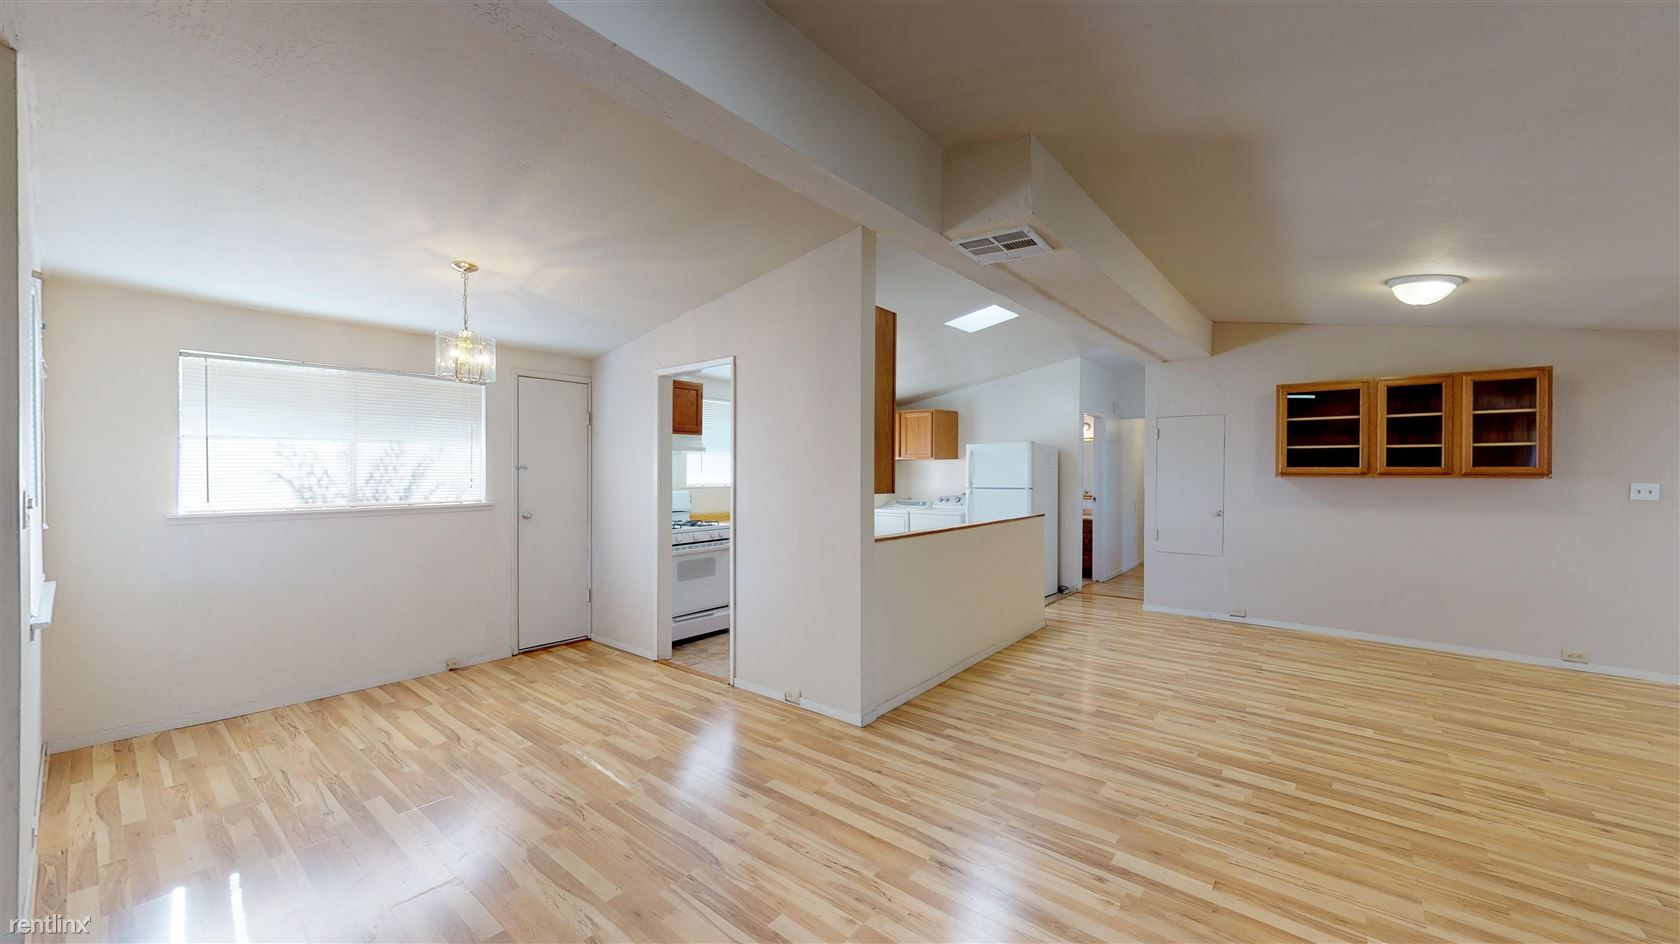 Kratos Haus for rent